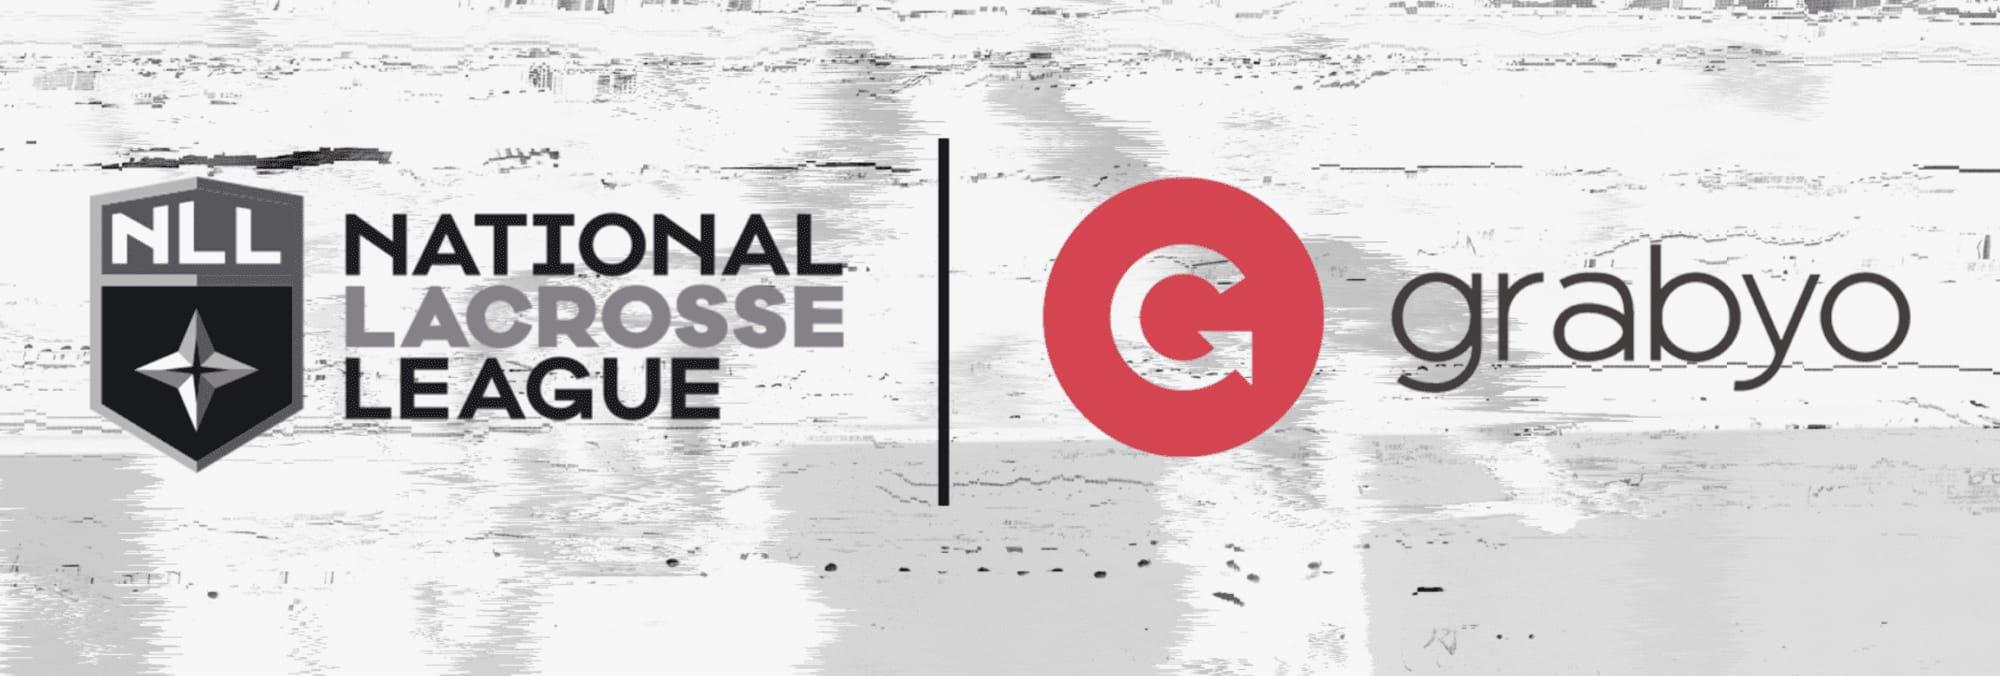 national lacrosse league nll grabyo